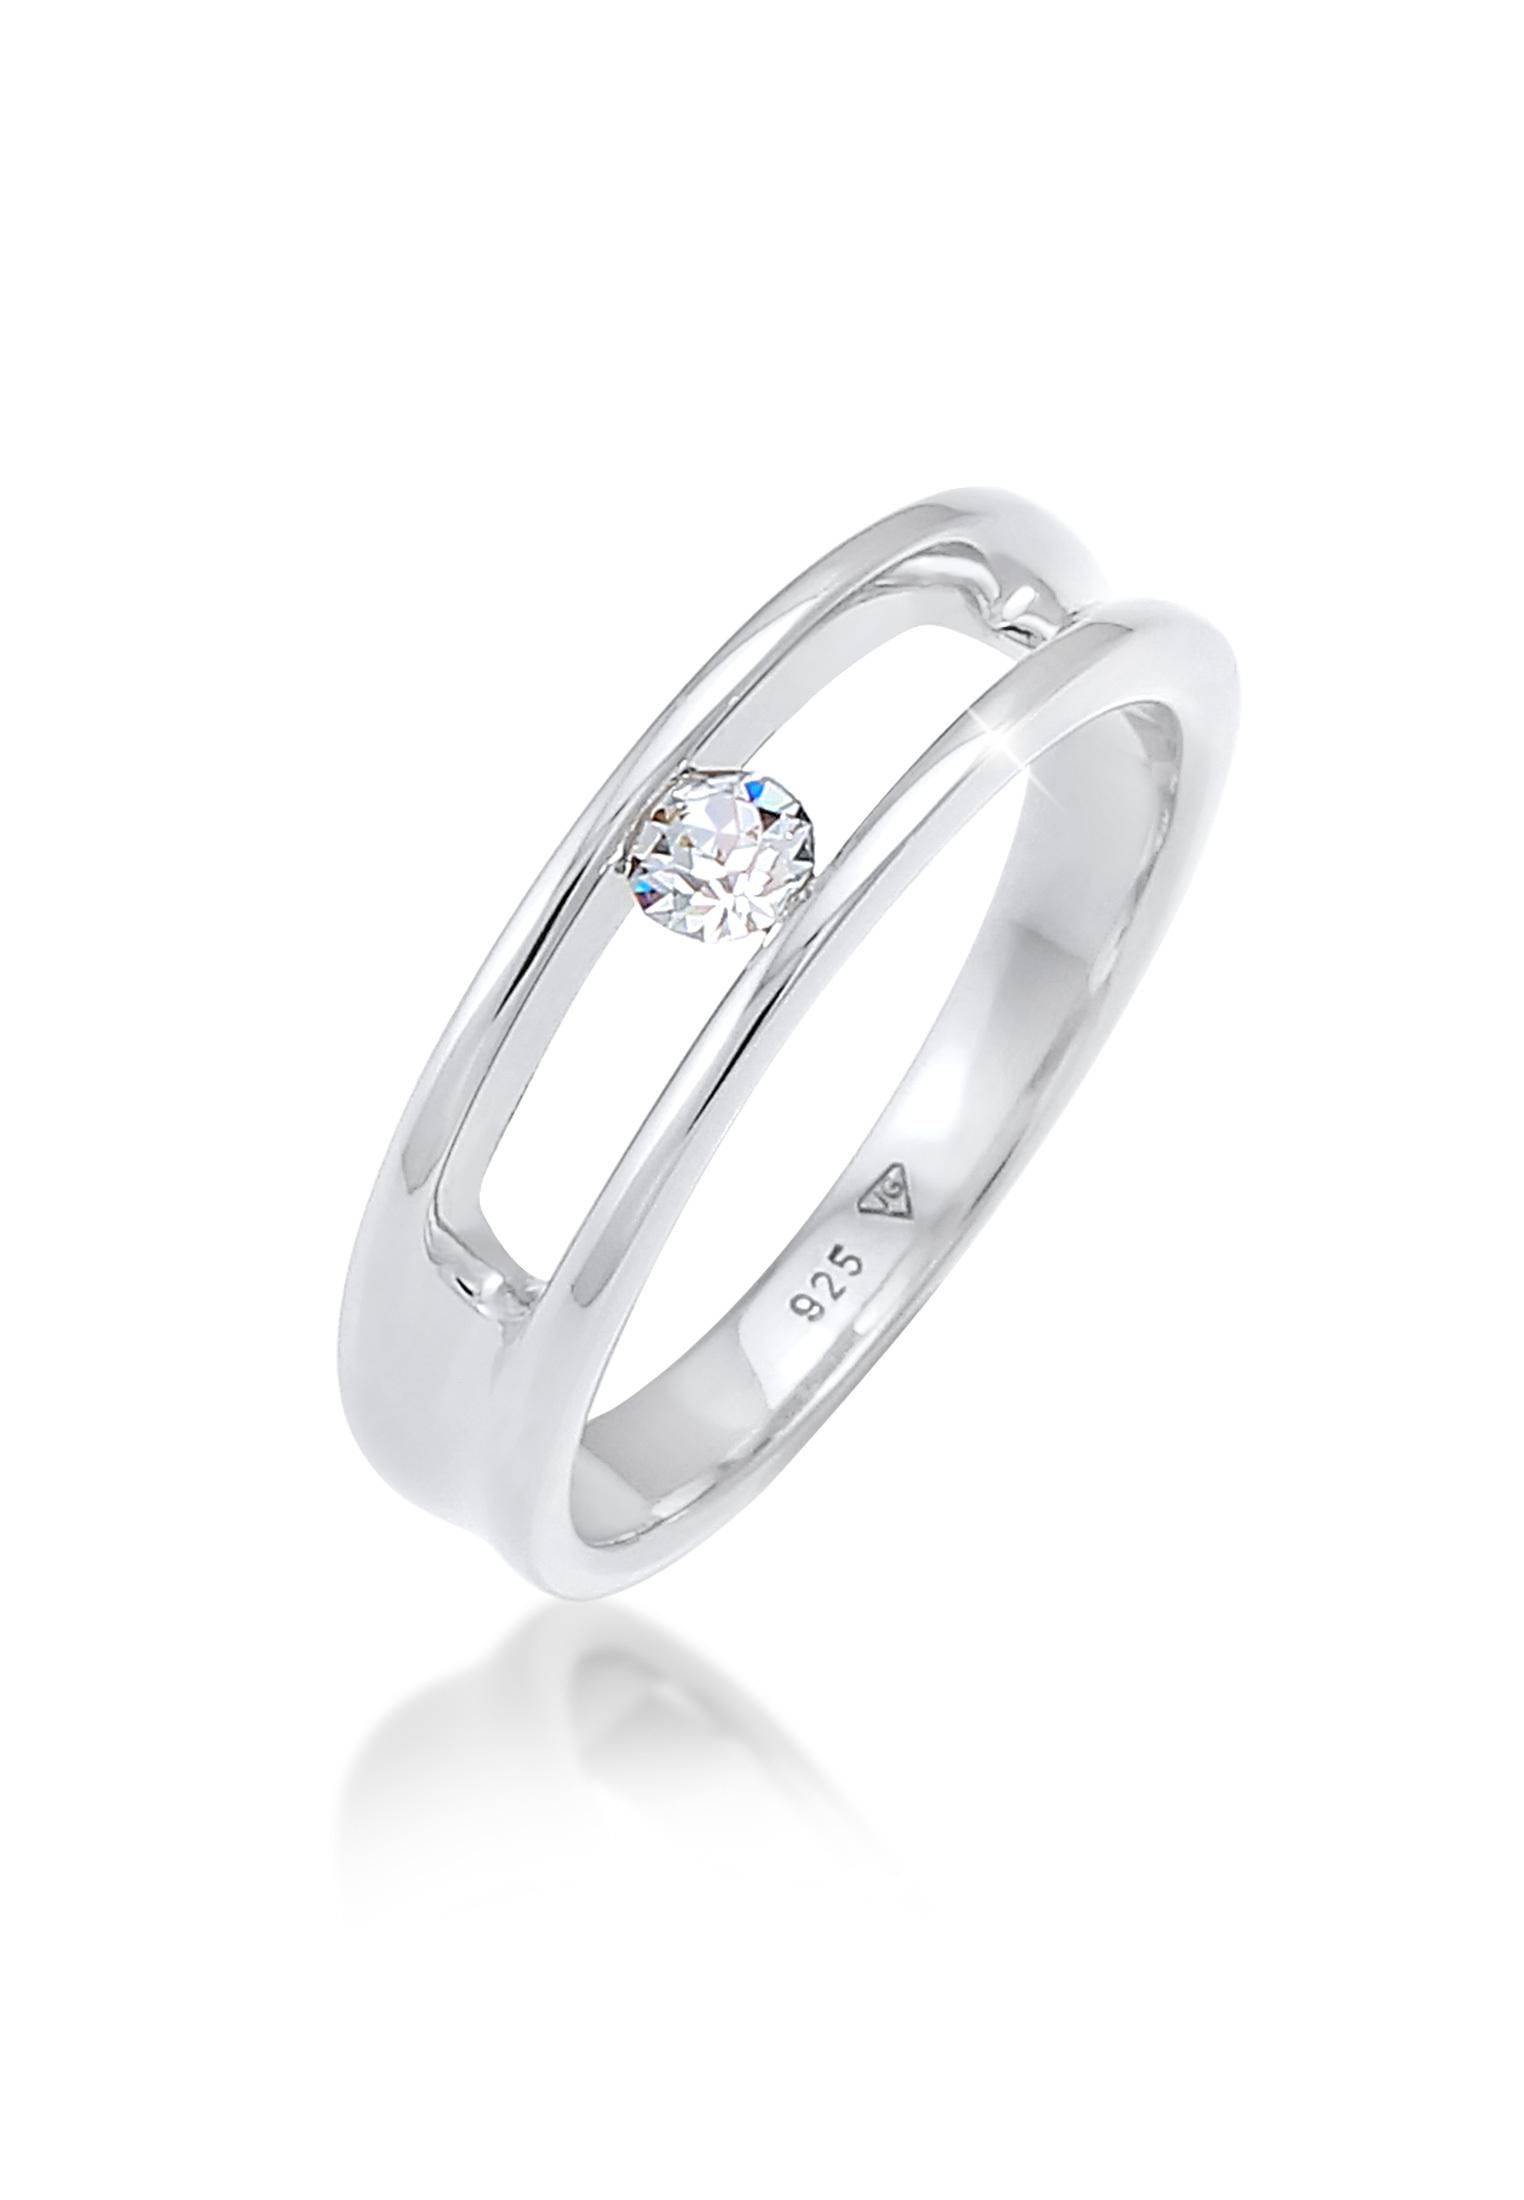 Solitär-Ring   Kristall ( Weiß )   925er Sterling Silber